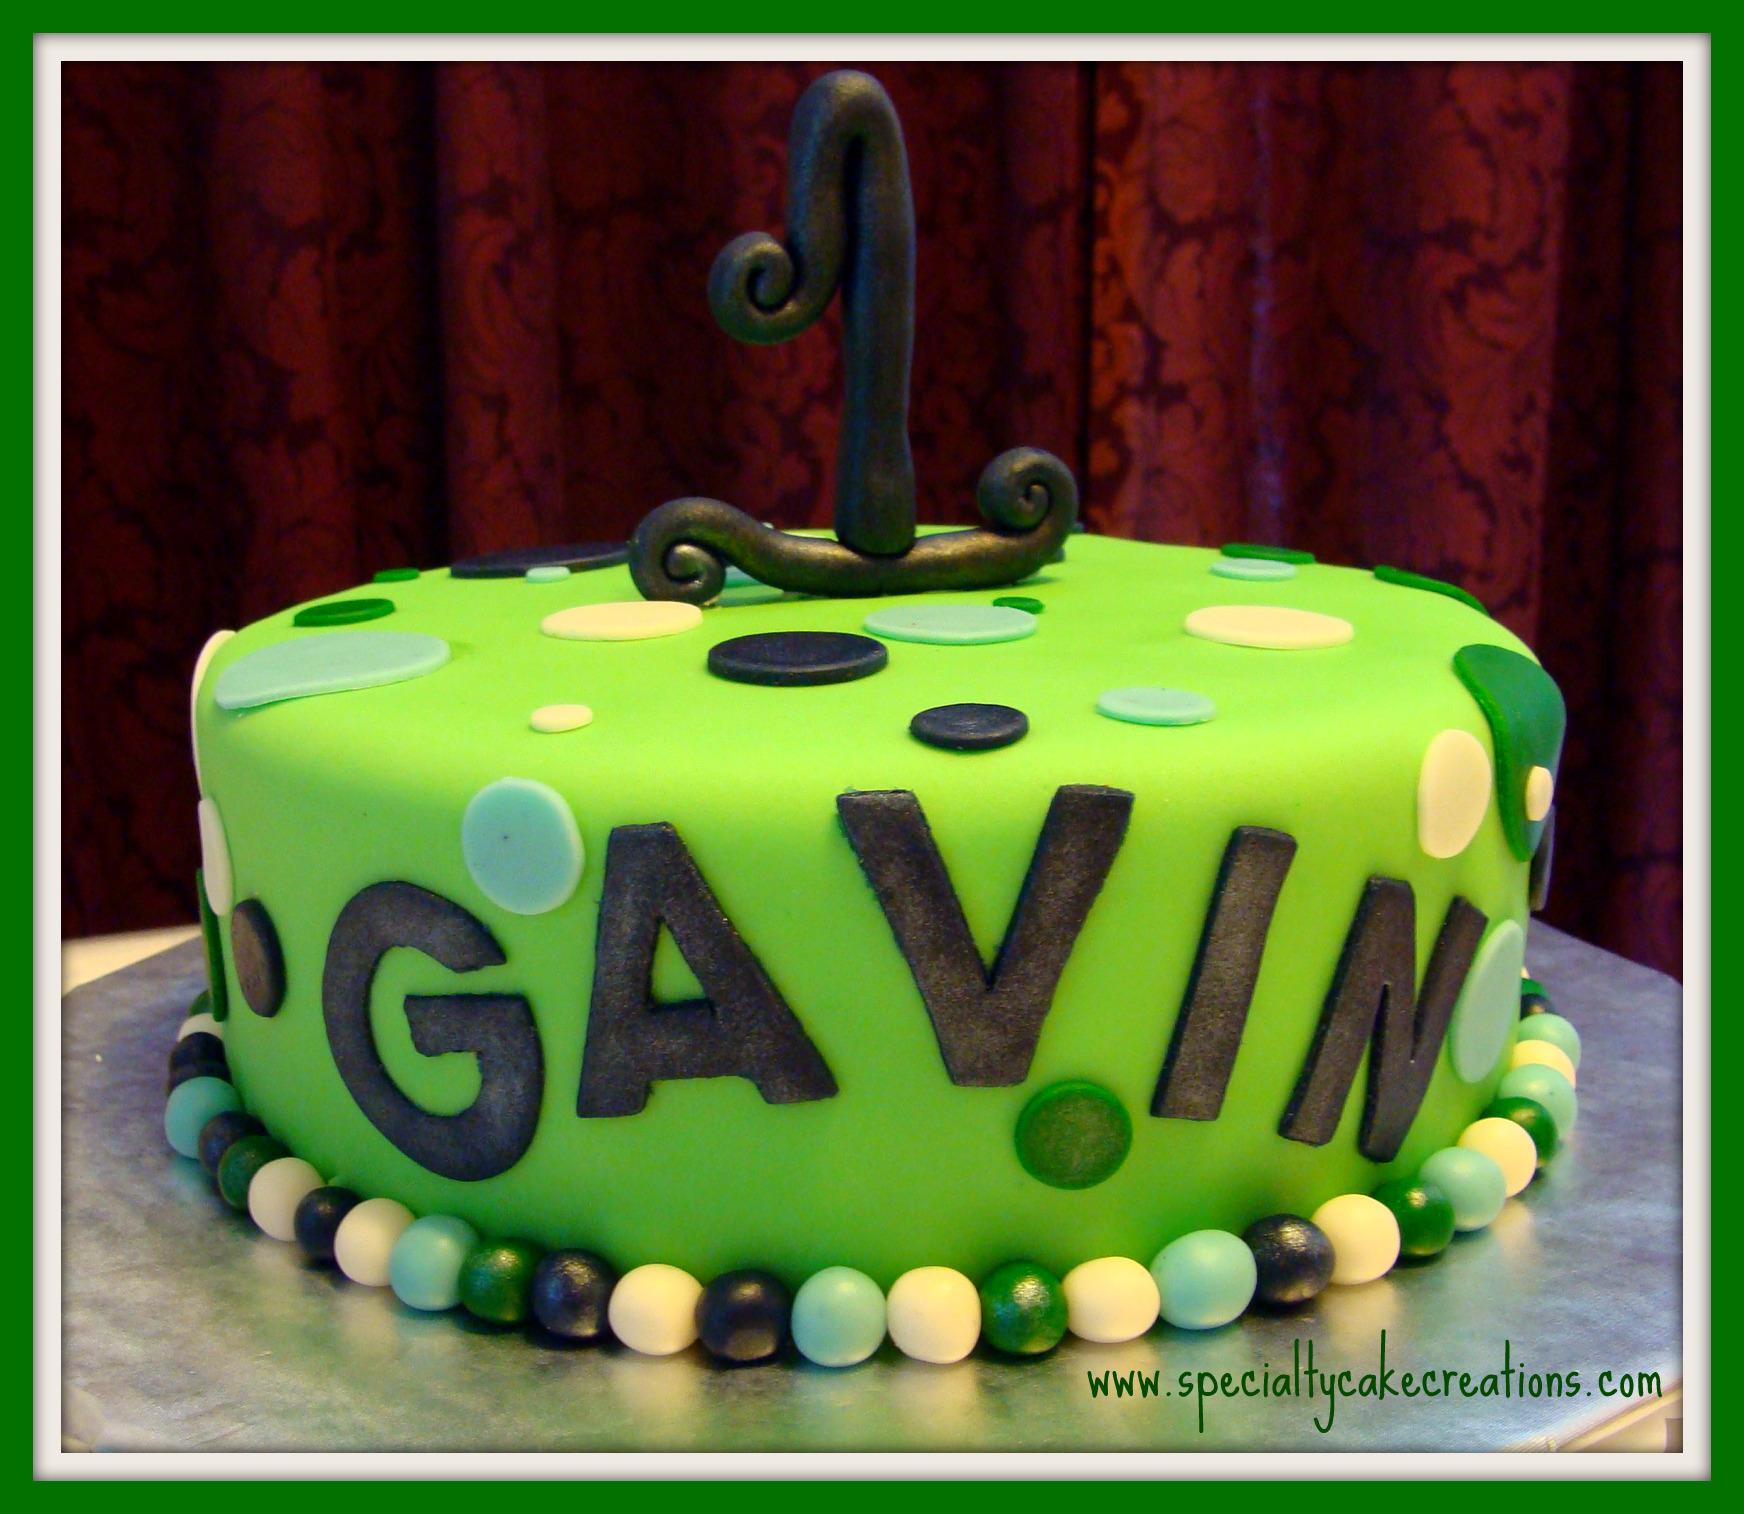 Birthday Cakes Specialty Cakes Kelowna Page 2